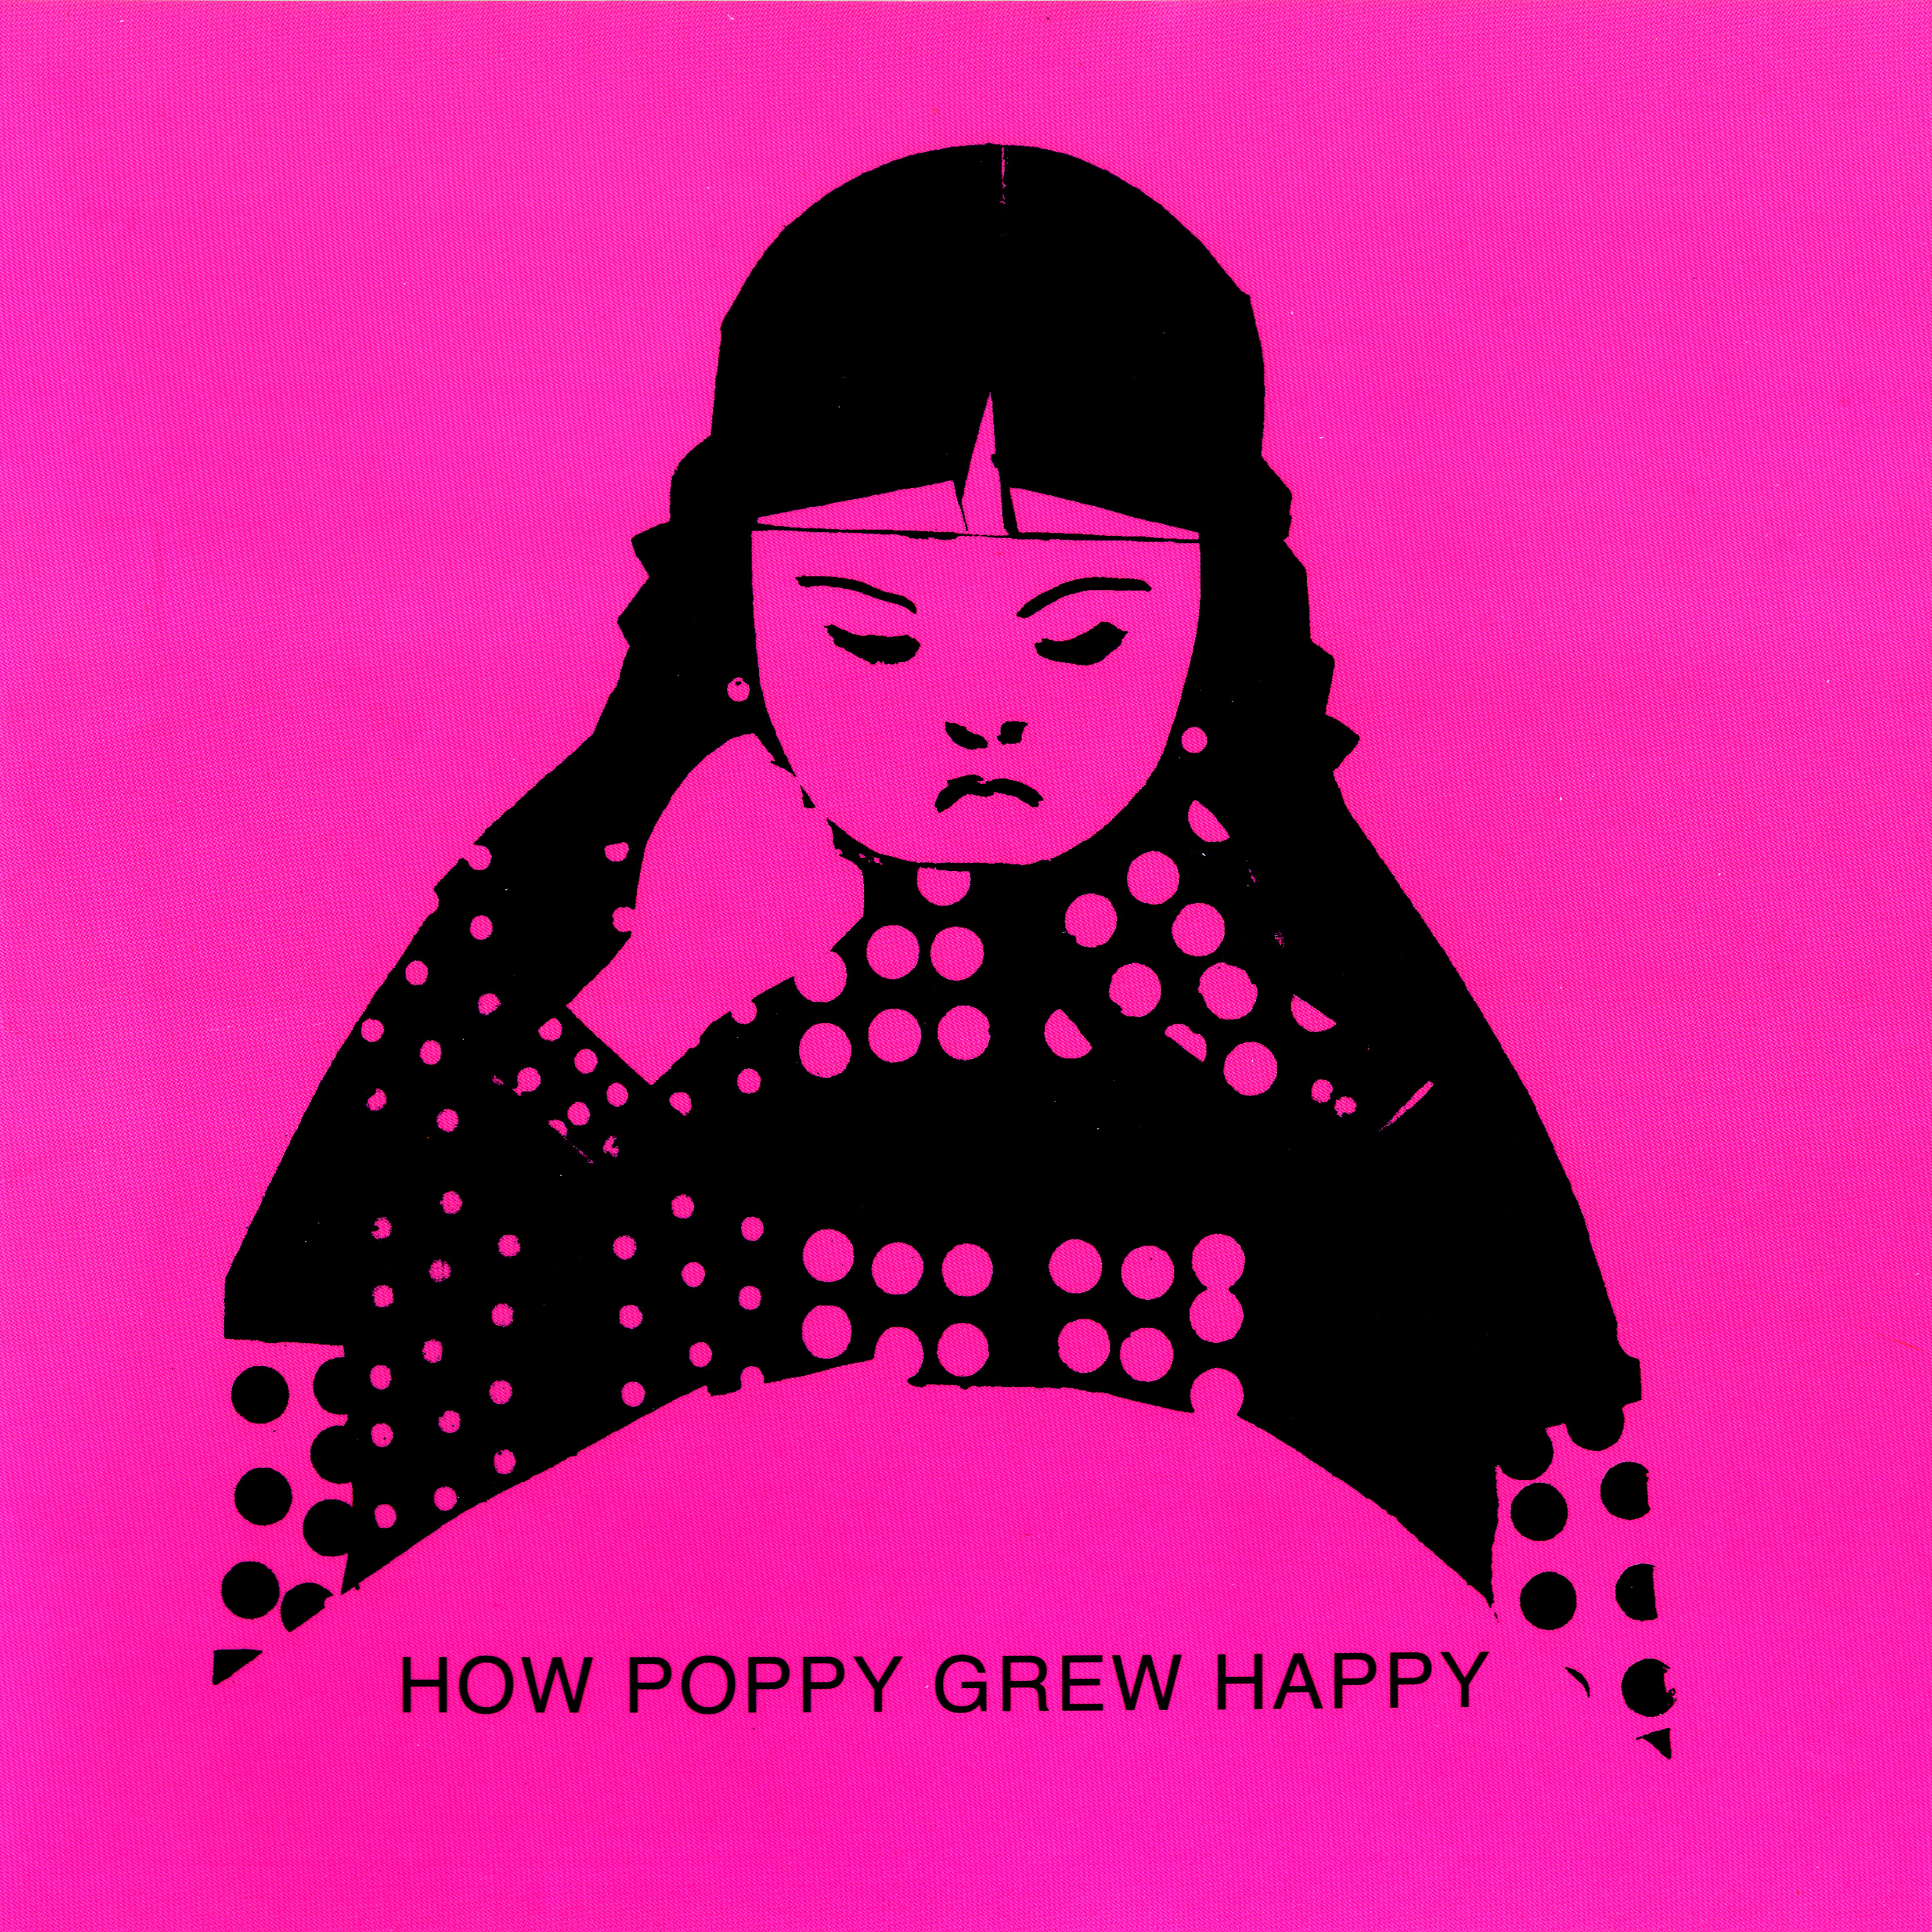 How Poppy Grew Happy by K. G. Subramanyan | Seagull Books